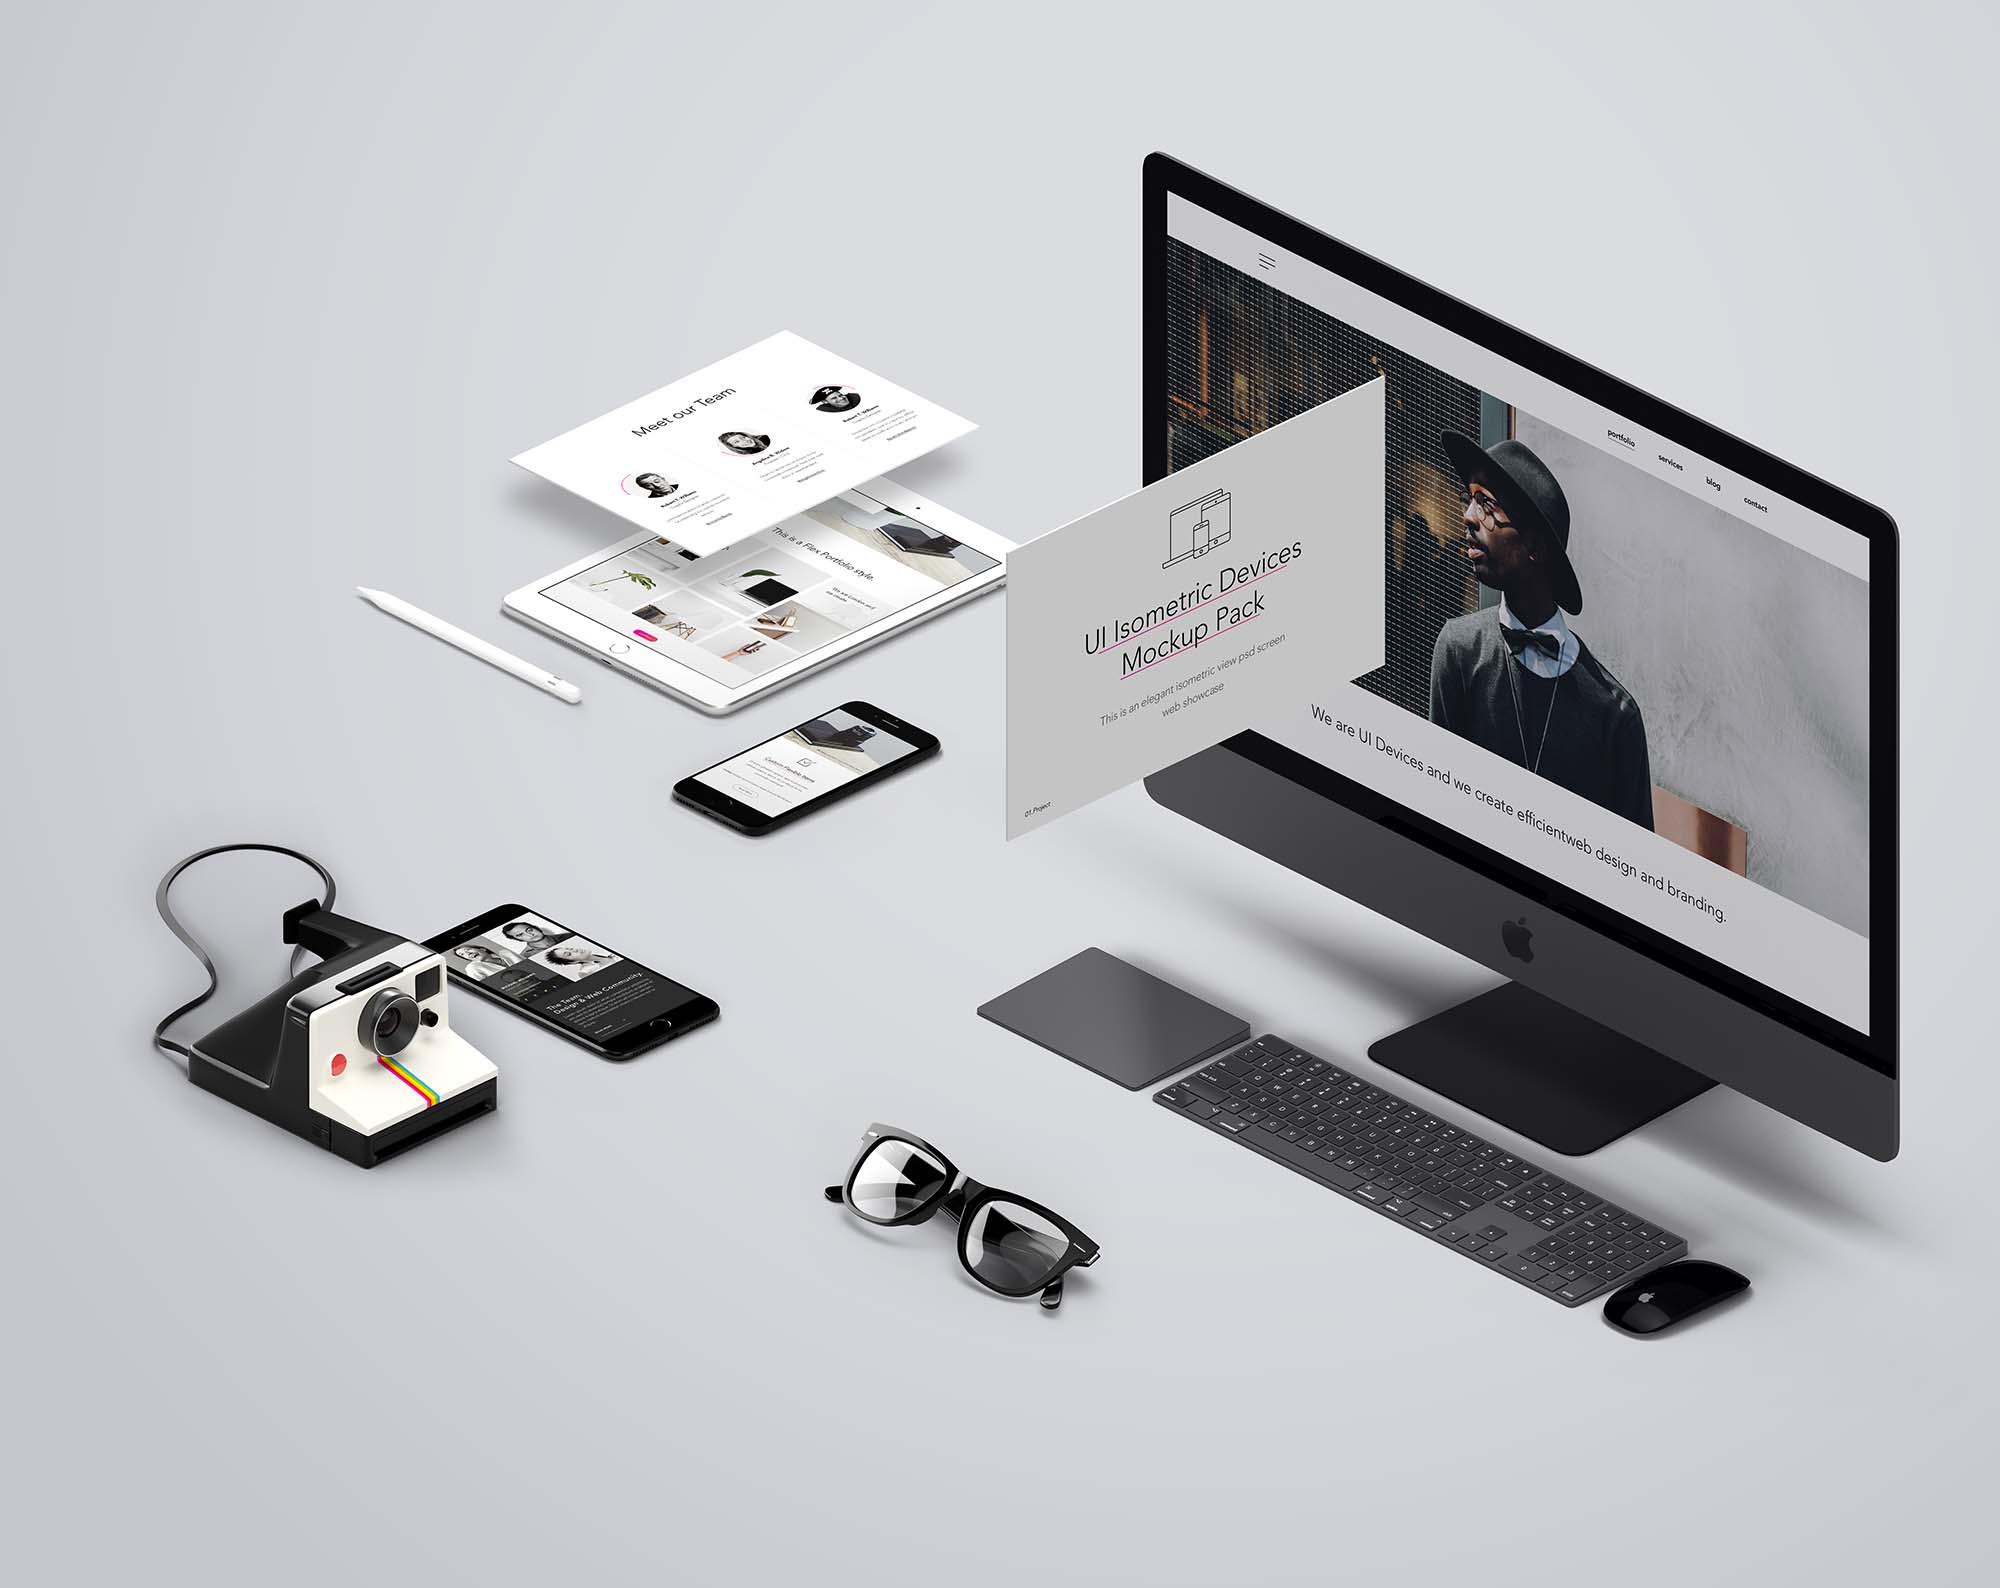 UI Isometric Devices Mockup